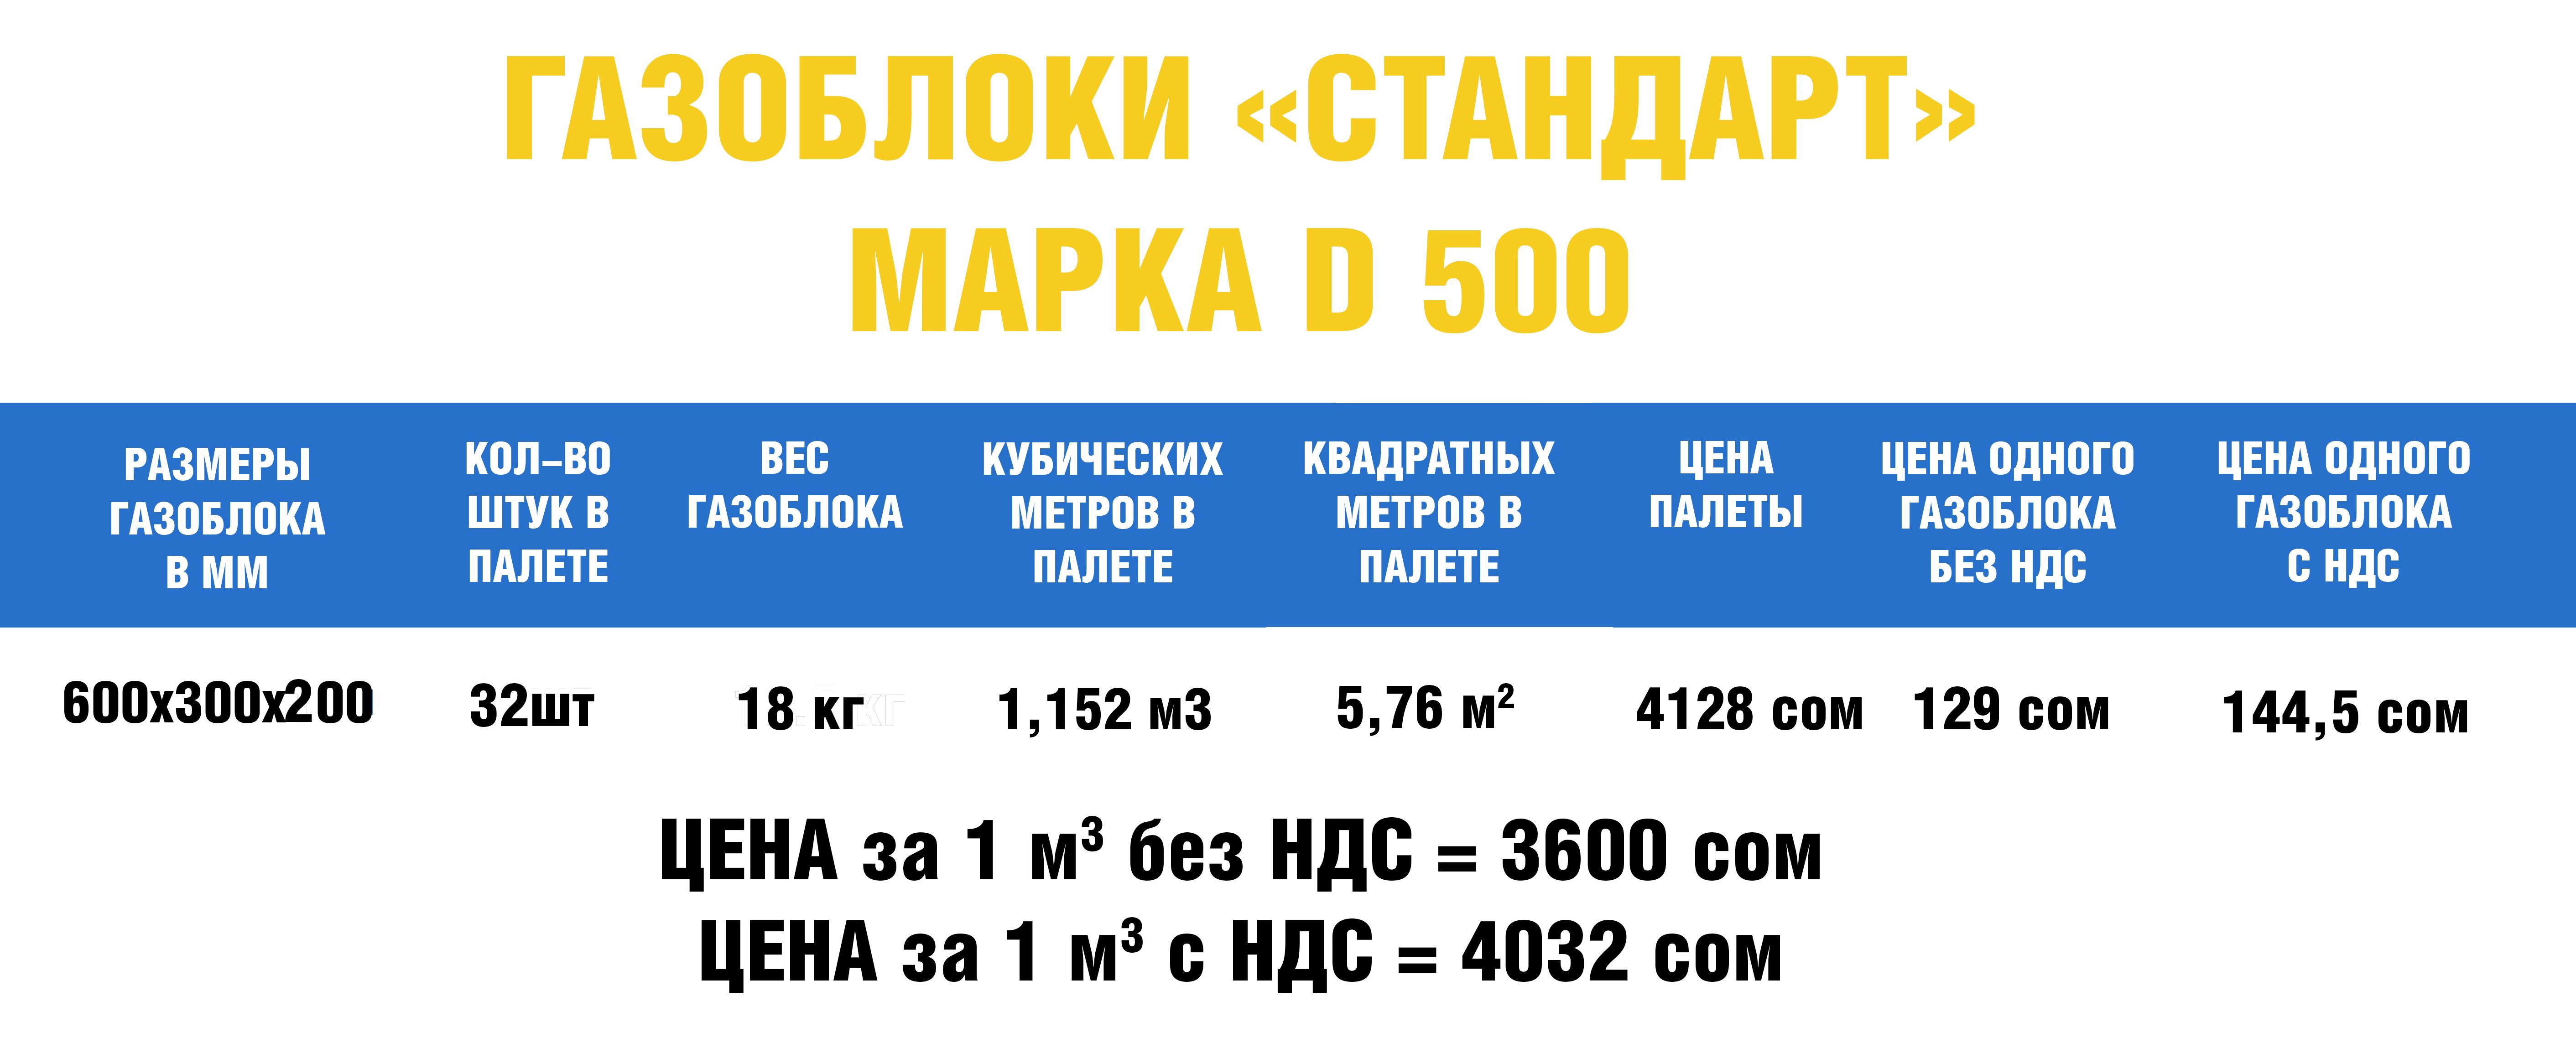 Д 500